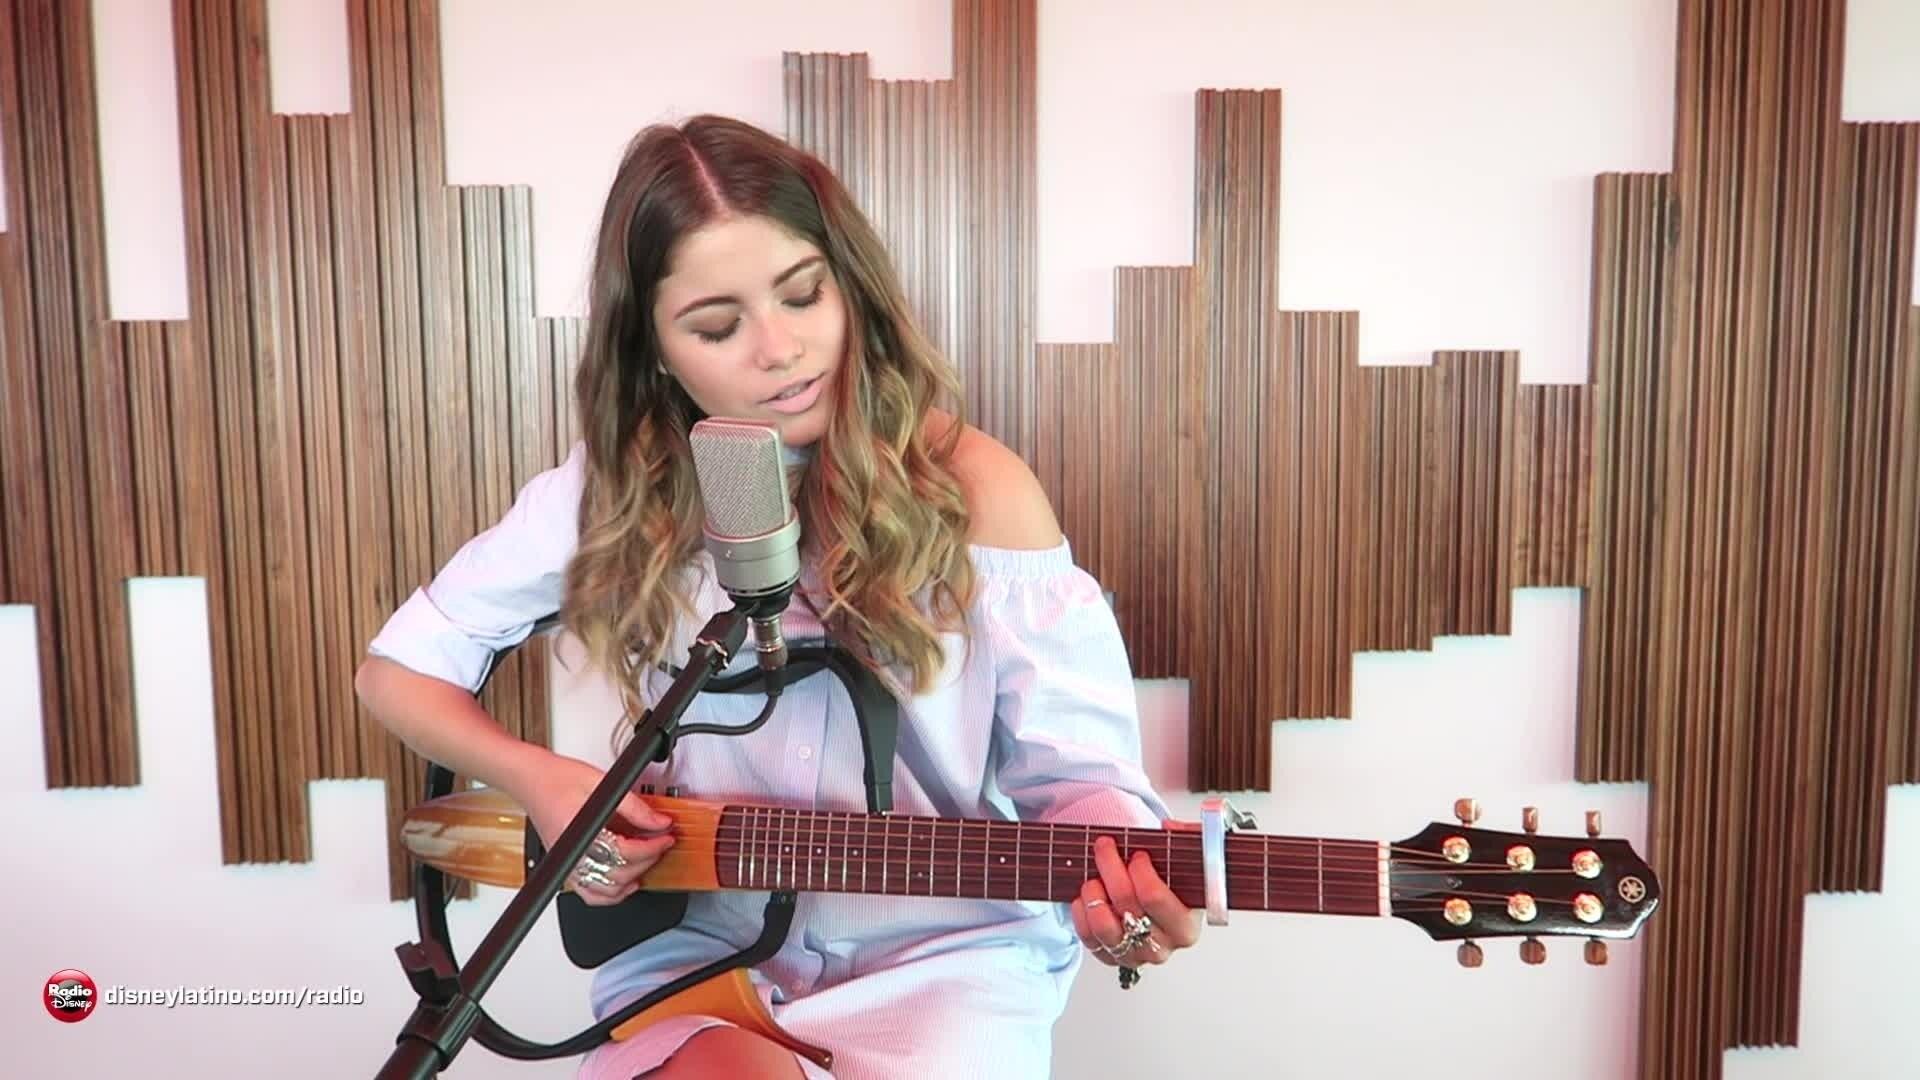 Sofía Reyes - Llegaste tu